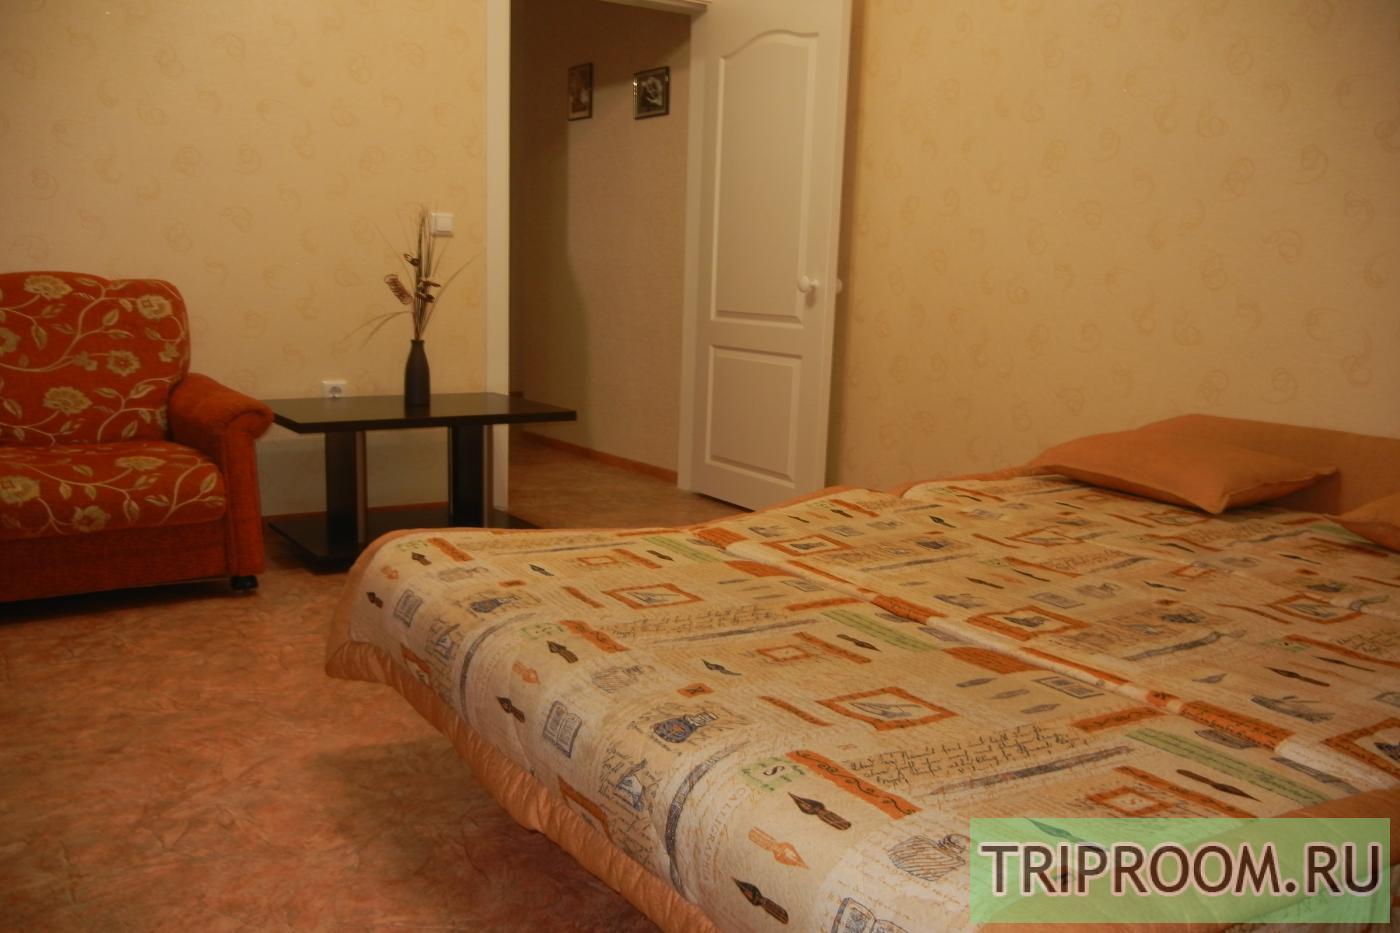 2-комнатная квартира посуточно (вариант № 13501), ул. Пеше-стрелецкая улица, фото № 5